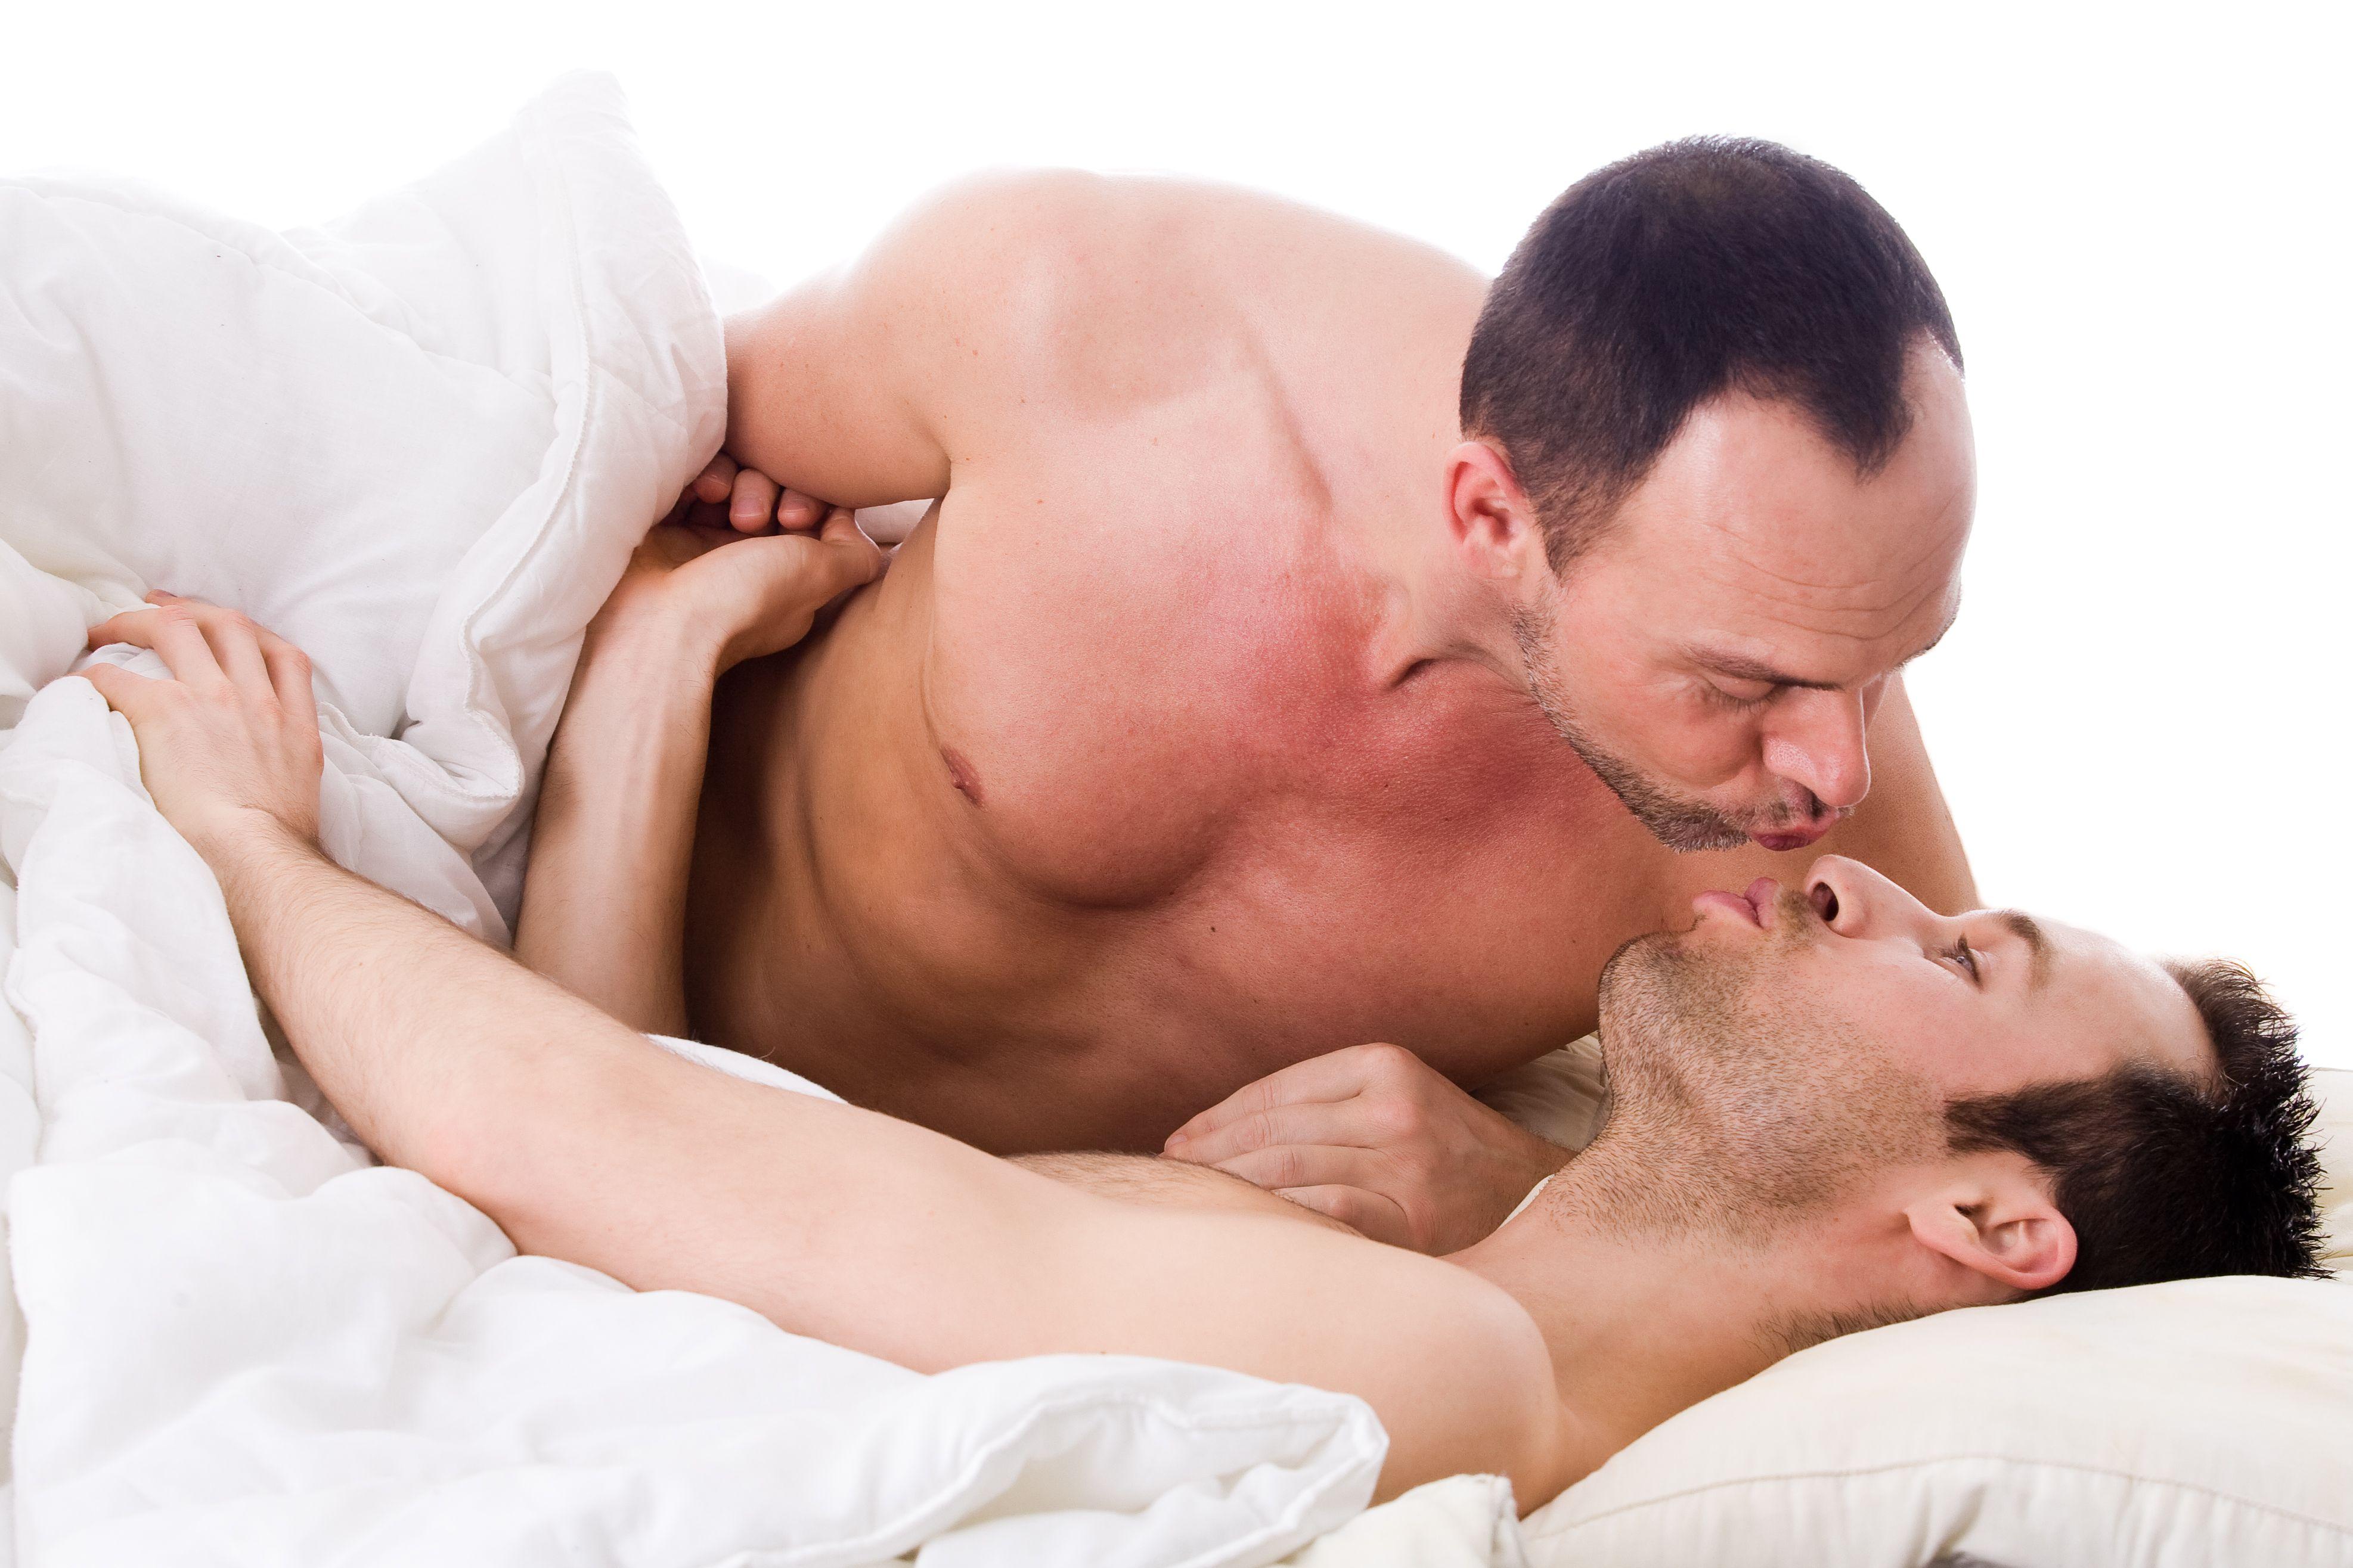 Italian shemale porn pics